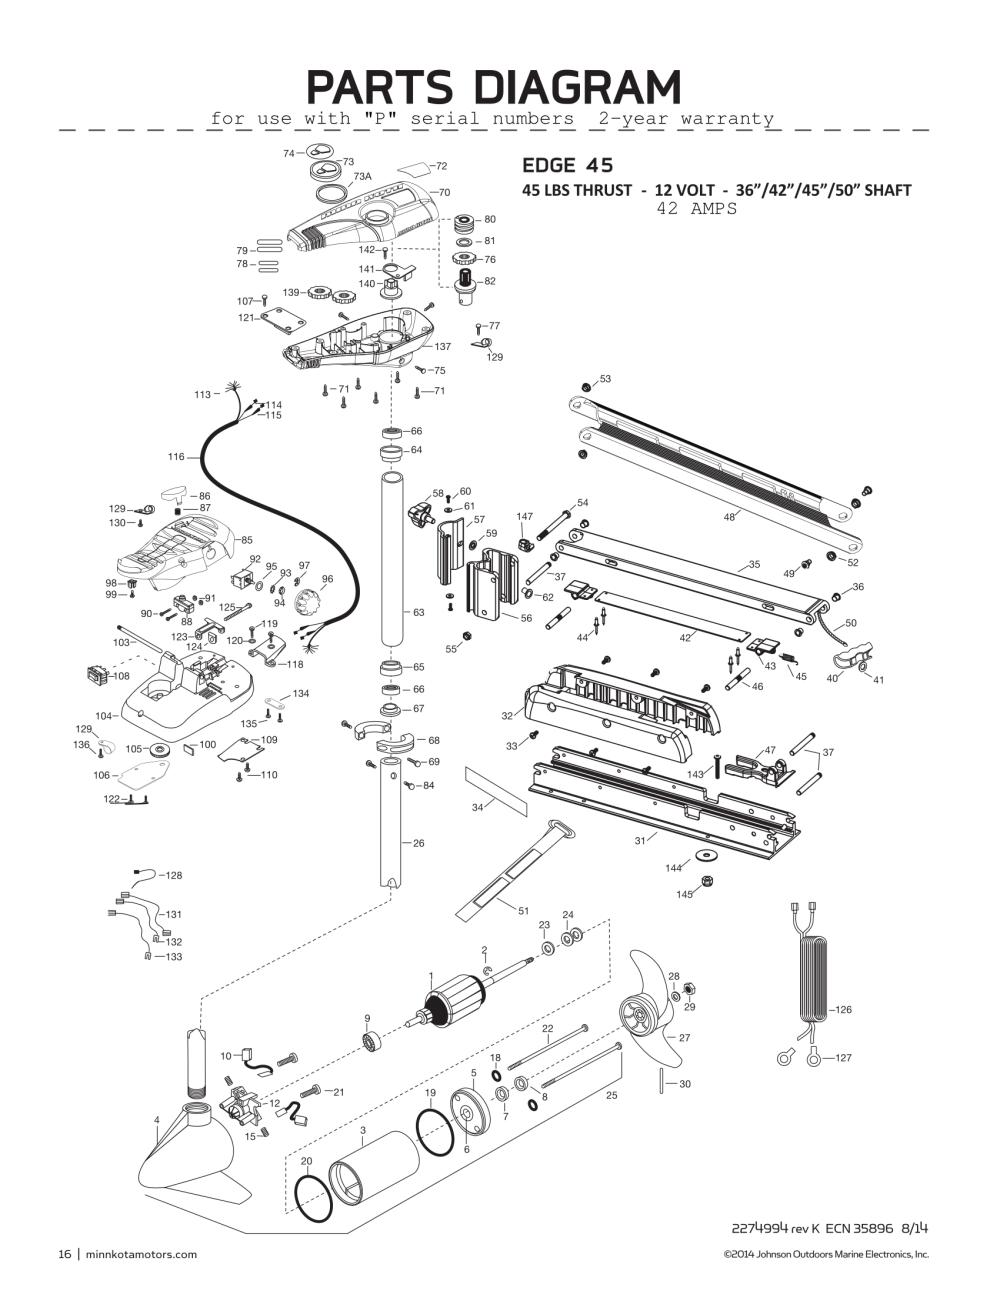 medium resolution of minn kota edge parts diagram wiring minn kota battery charger engine schematic riptide wiring schematic